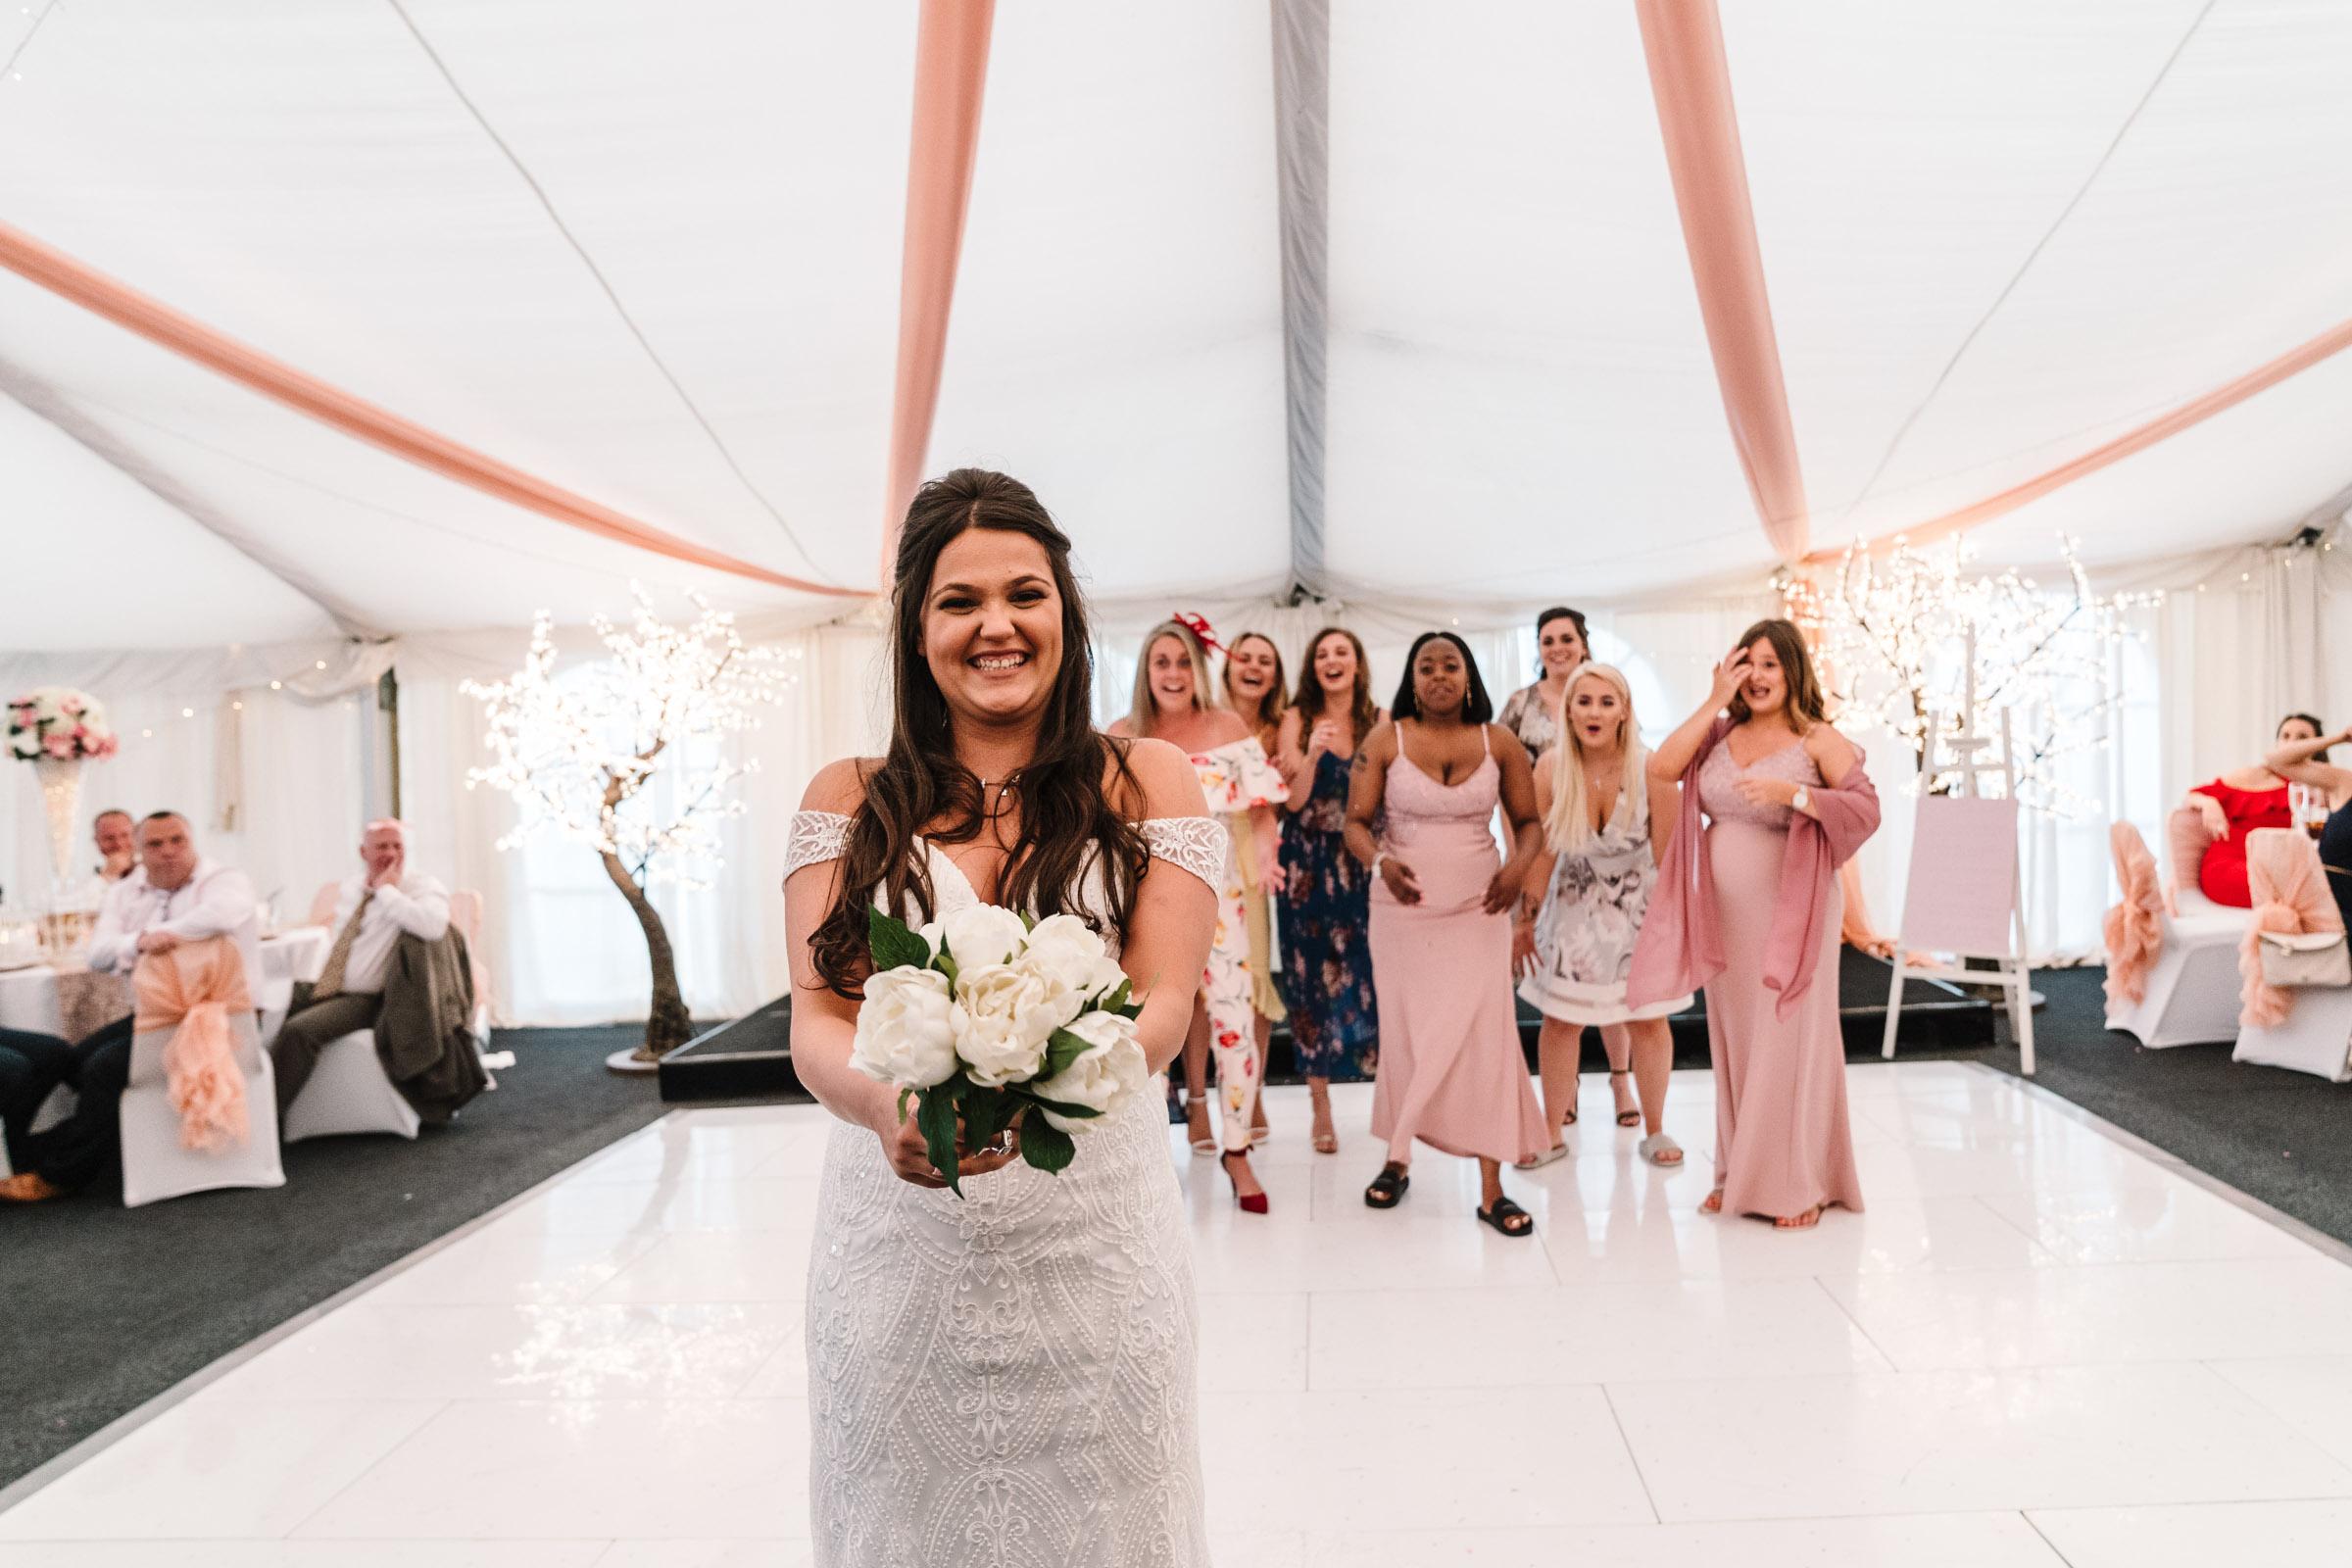 bride throwing wedding bouquet, royal arms hotel